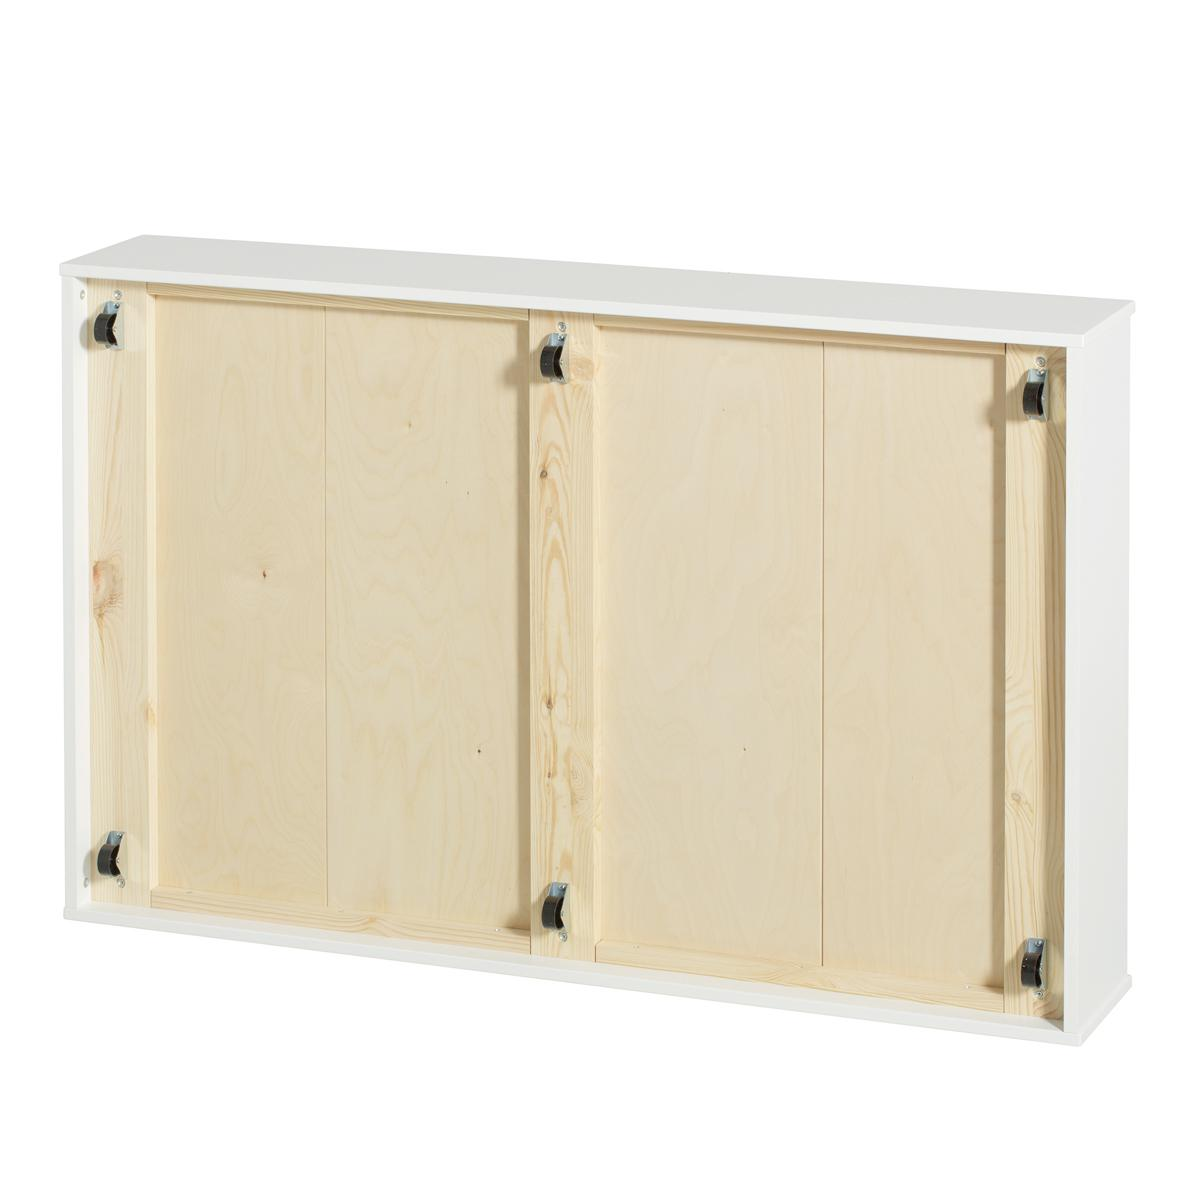 Tiroir lit 94x142cm WOOD ORIGINAL Oliver Furniture blanc